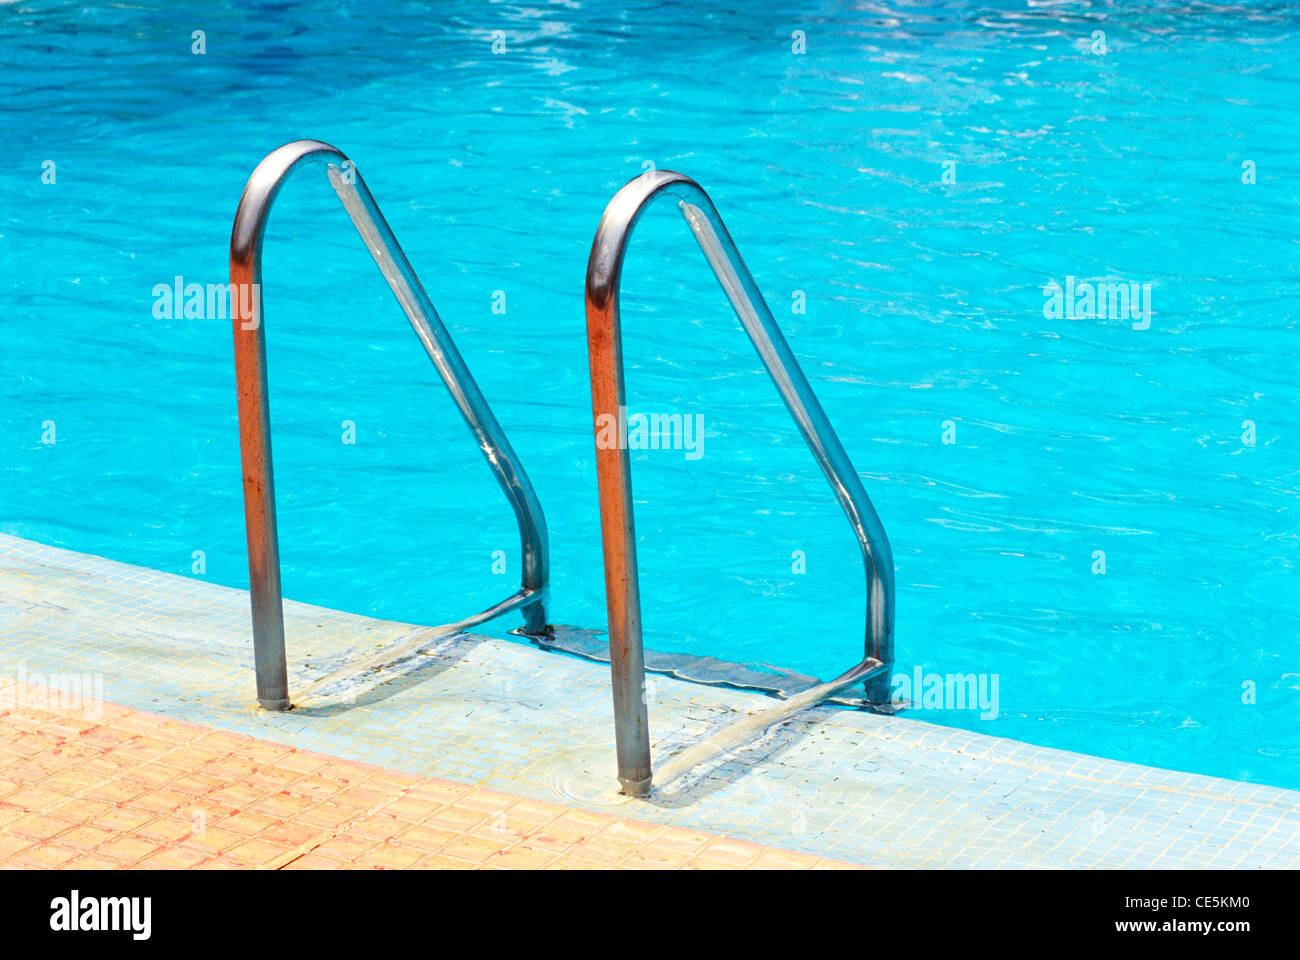 Stainless Steel Metal Handrail Hand Rail Swimming Pool Stock Photo 43151136 Alamy